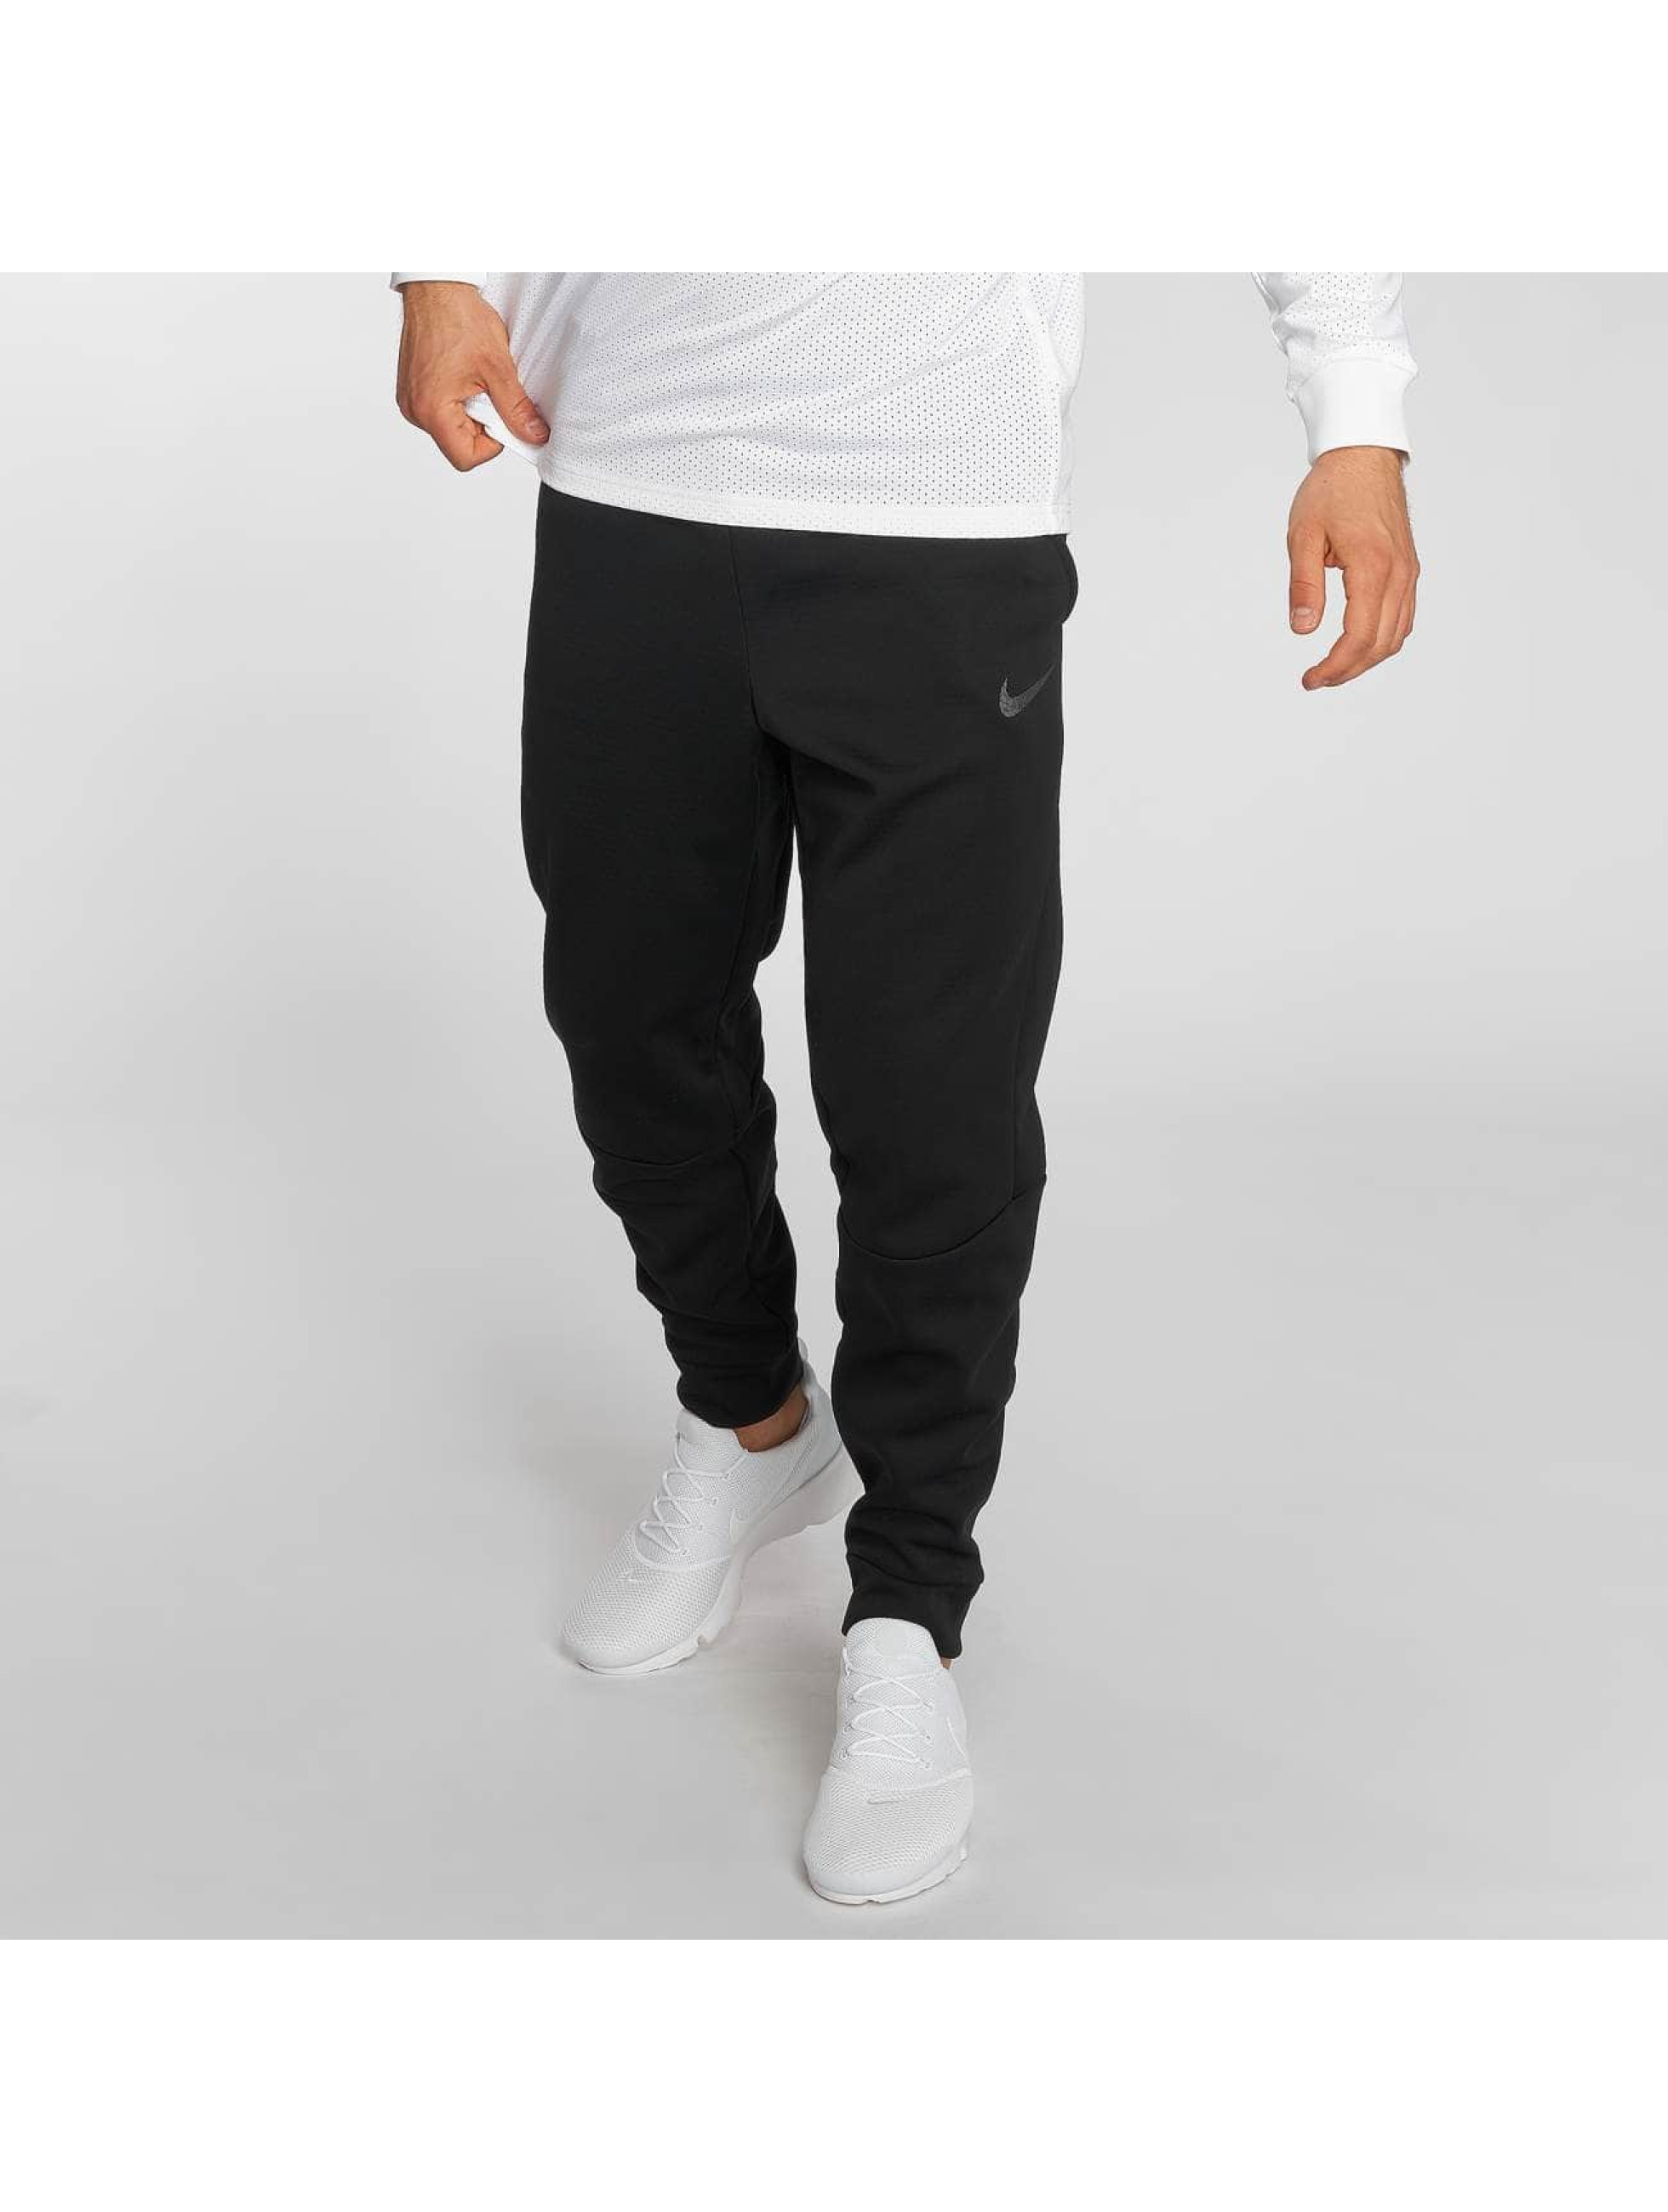 Nike Performance Спортивные брюки Therma Sphere черный